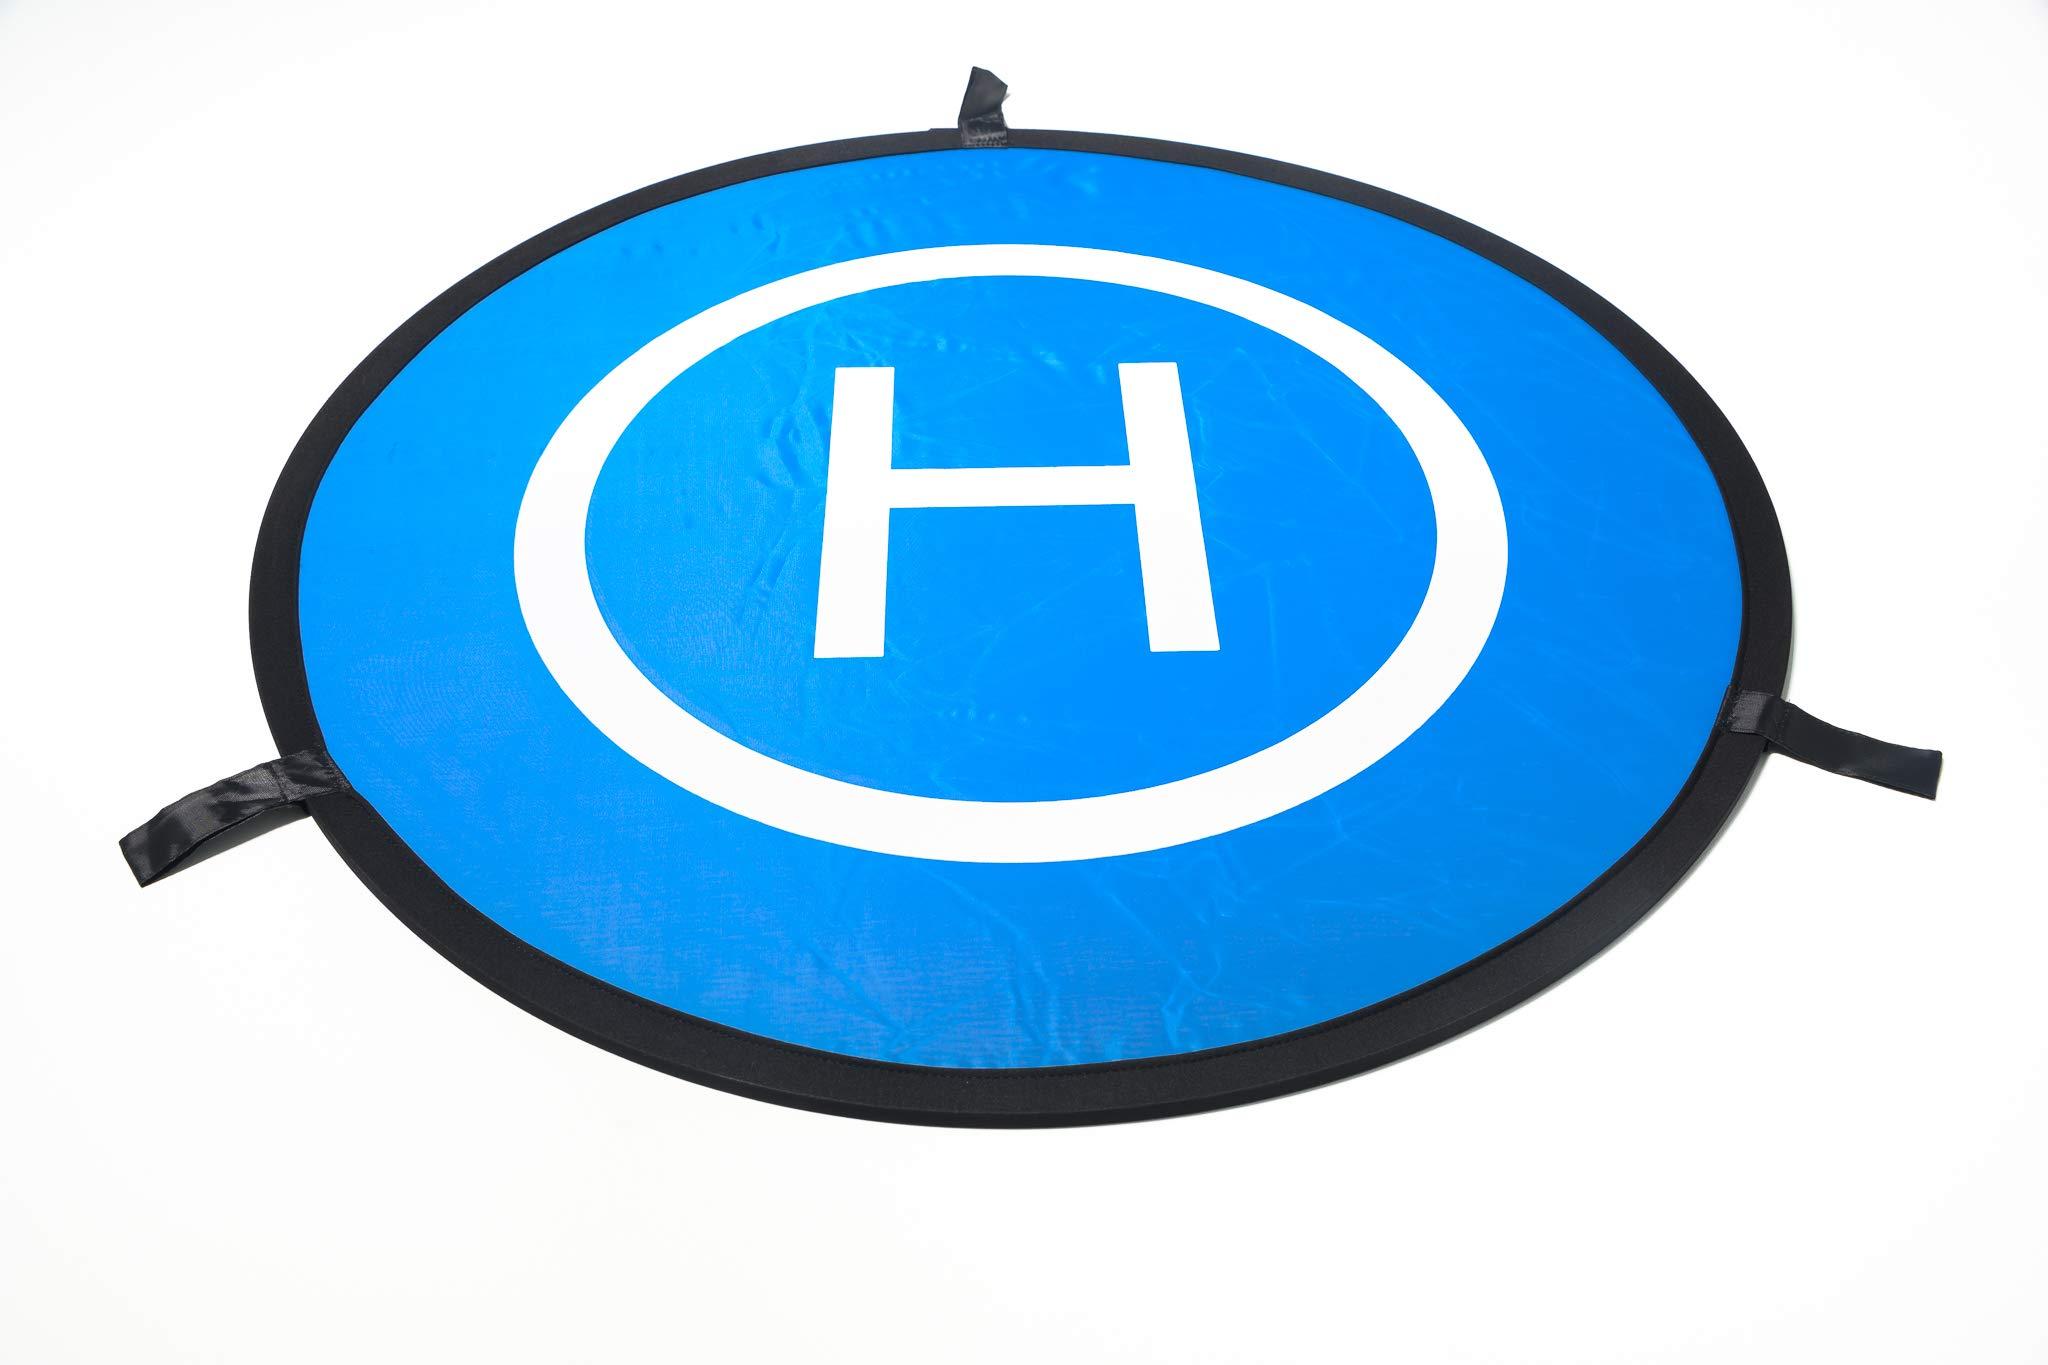 Drones Landing Pad,Homga Universal Waterproof D 75cm/30'' Portable Foldable Landing Pads for RC Drones Helicopter, PVB Drones, DJI Mavic Pro Phantom 2/3/4/ Pro, Antel Robotic, 3DR Solo (Landing pad) by Homga